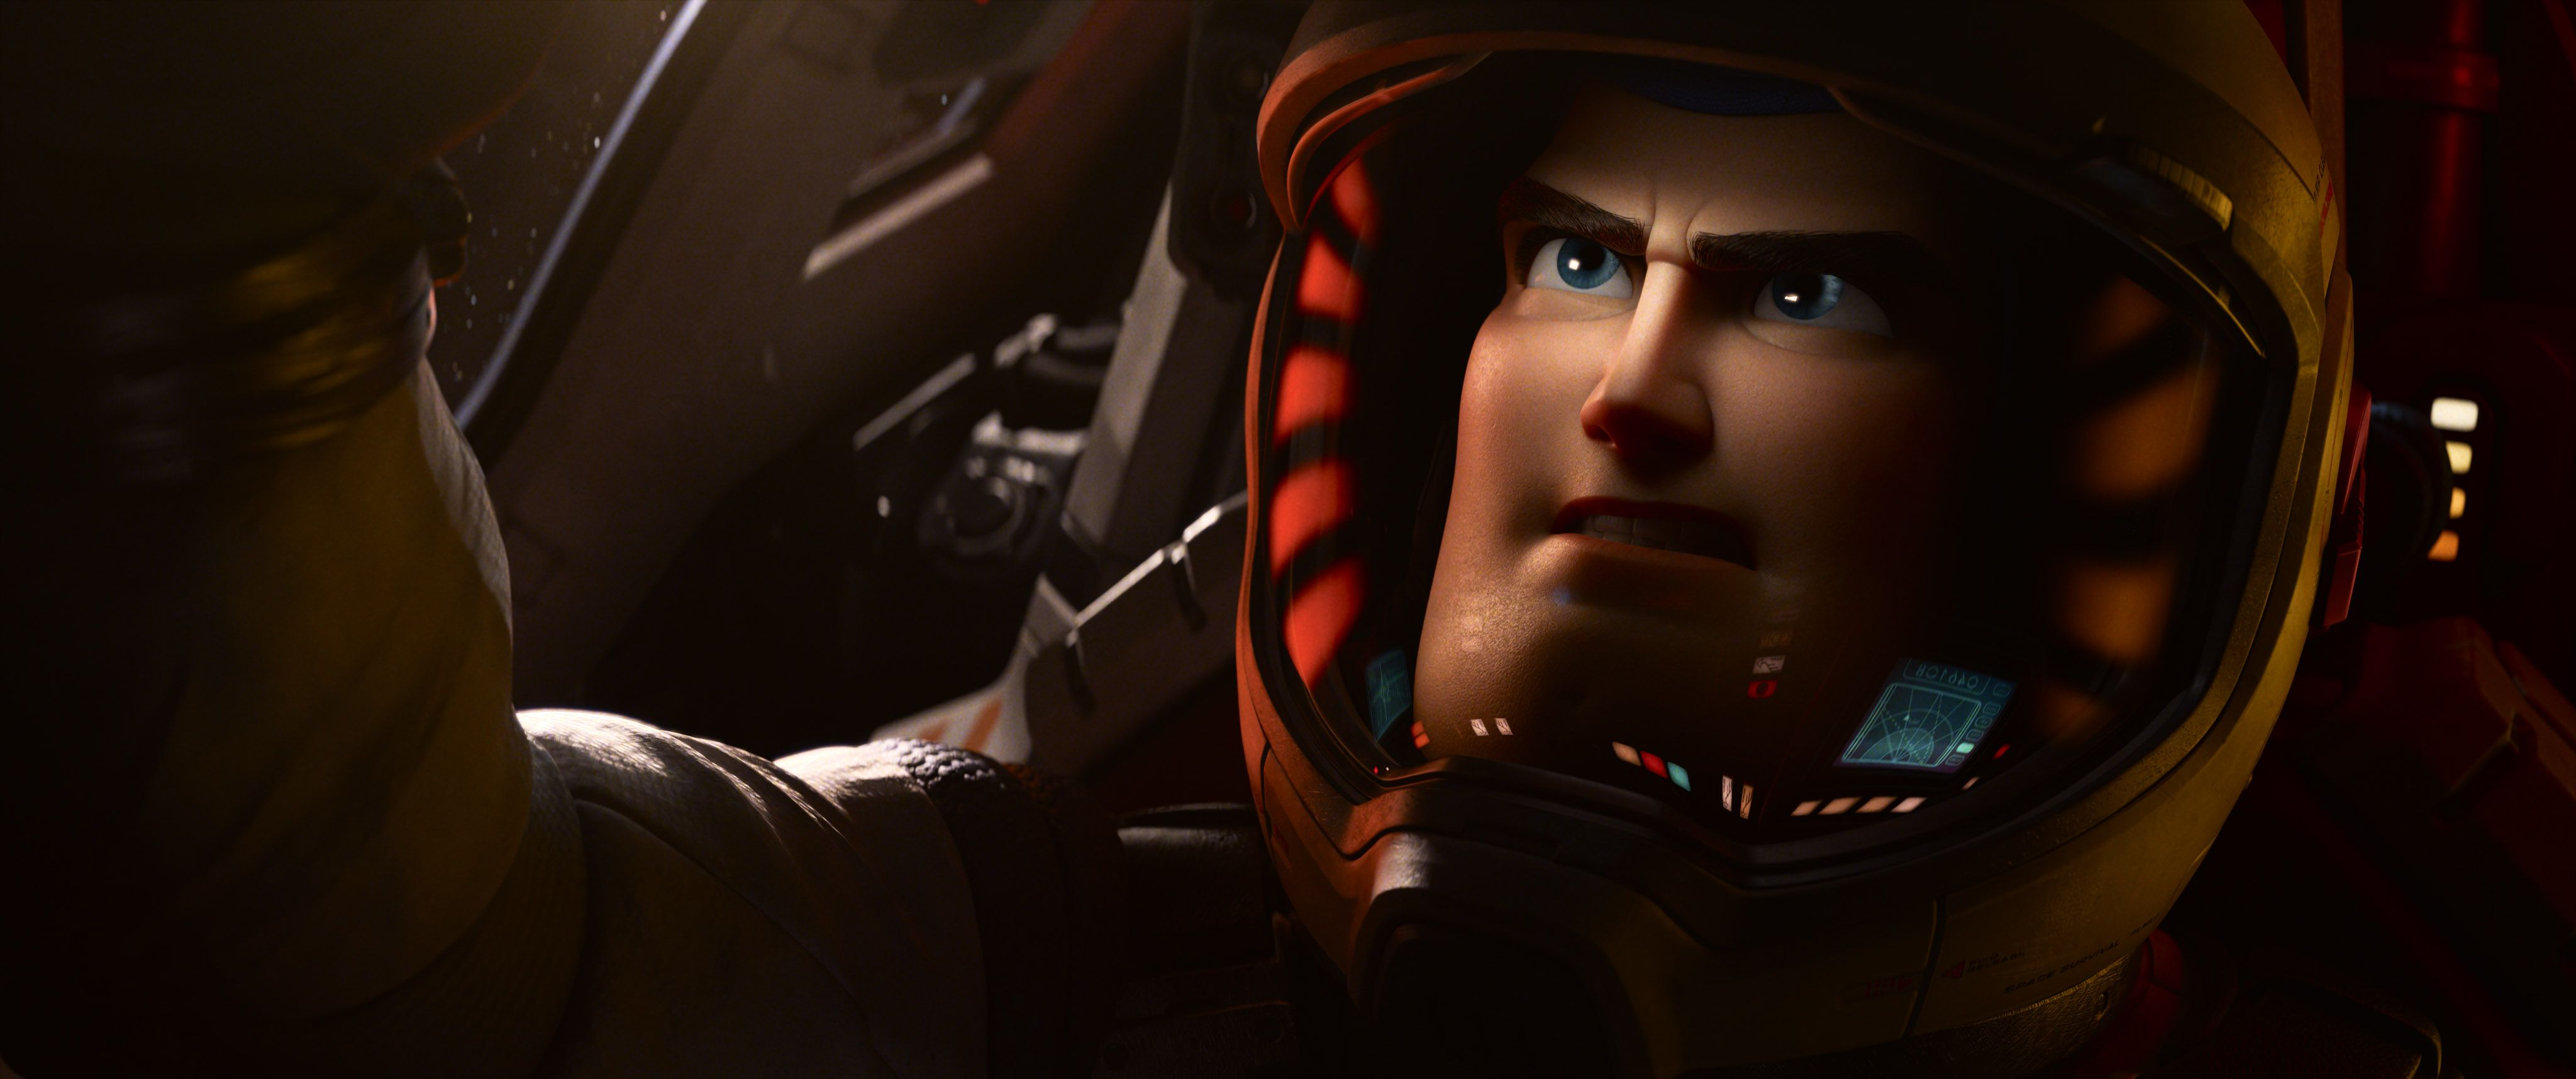 Lightyear il nuovo film Pixar in uscita al cinema